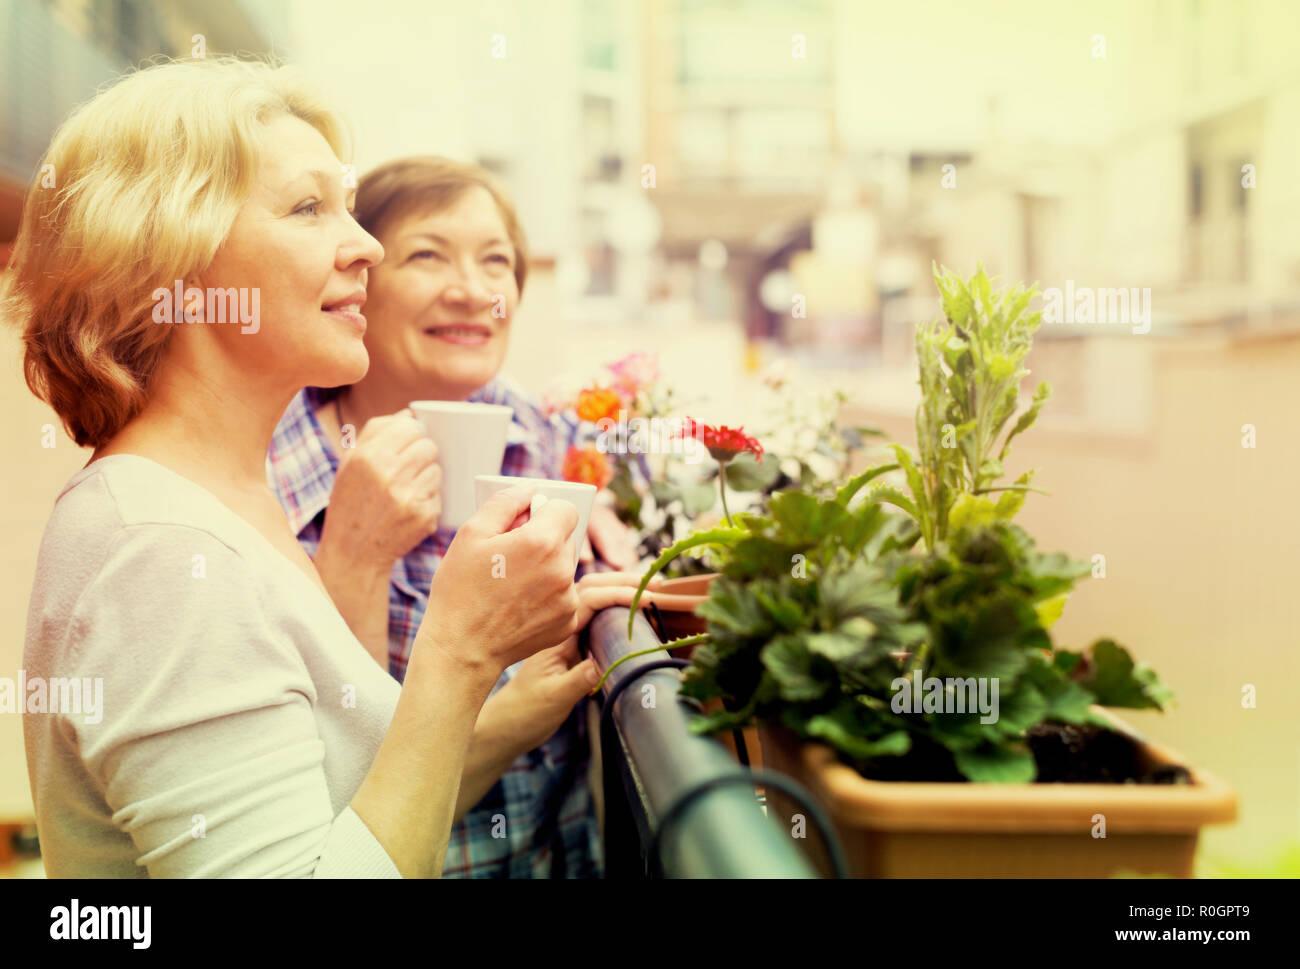 Multani mitti online dating